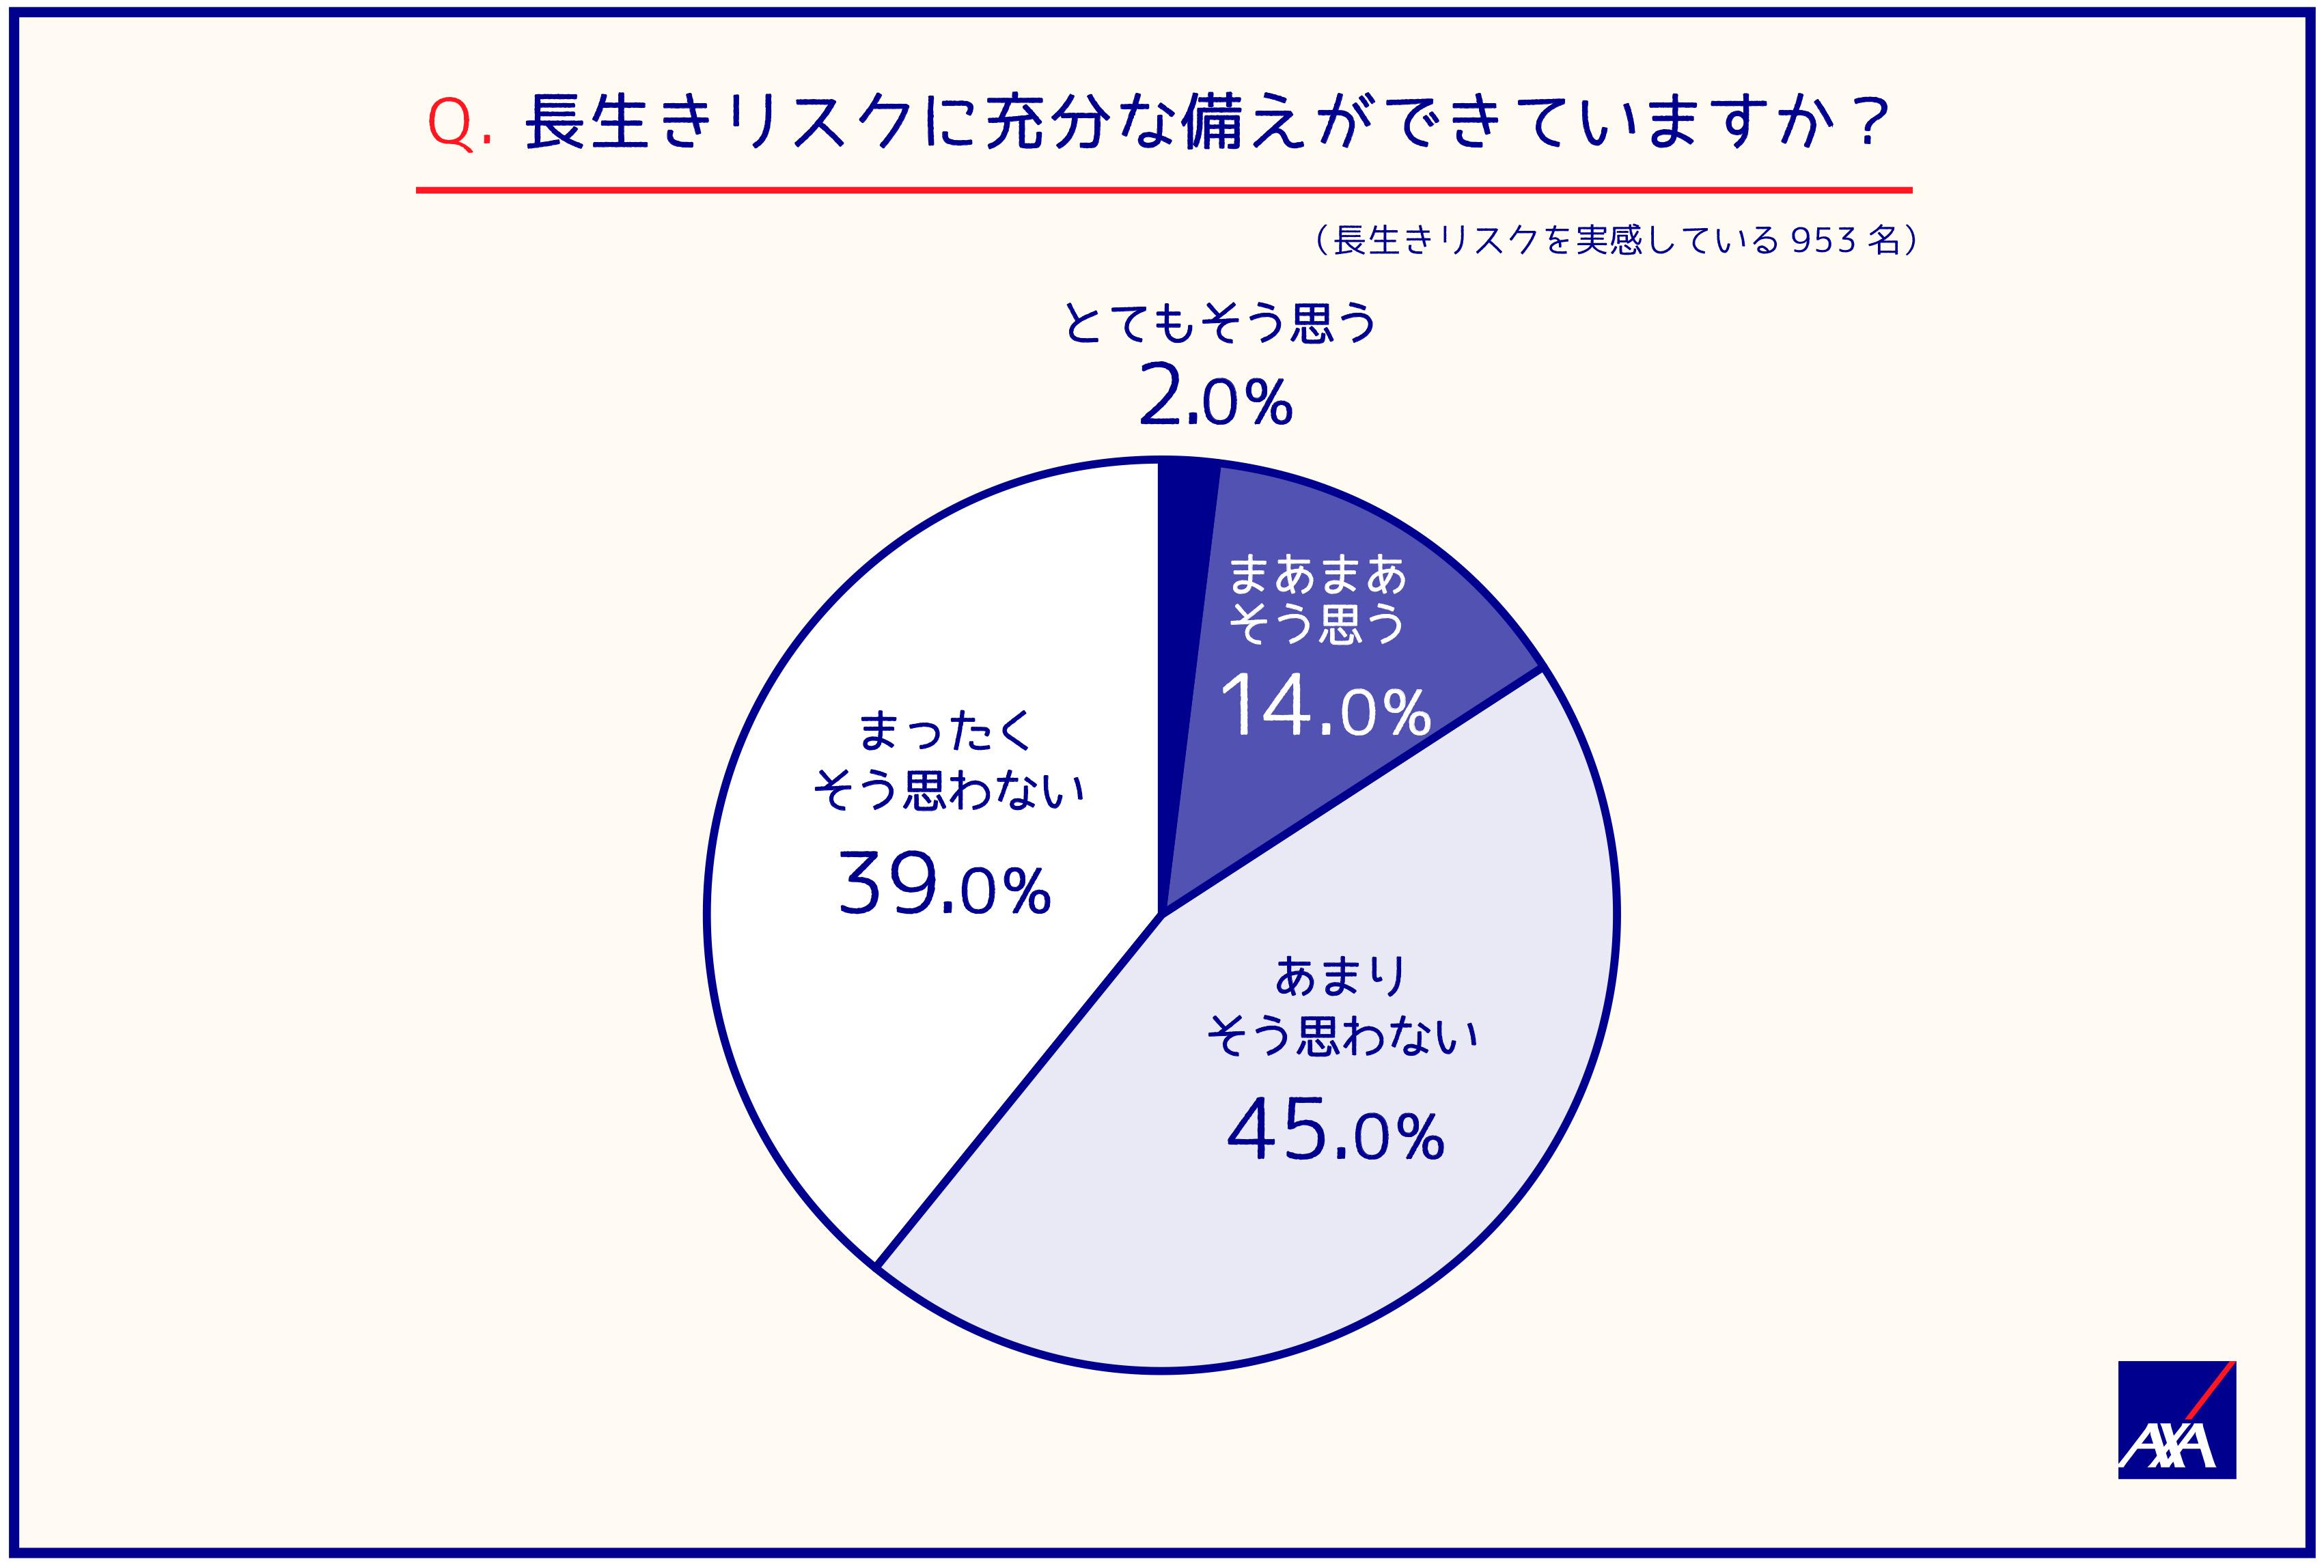 Q.長生きリスクに充分な備えができていますか?(長生きリスクを実感している953名) とてもそう思う;2.0% まあまあそう思う;14.0% あまりそう思わない;45.0% まったくそう思わない;39.0%